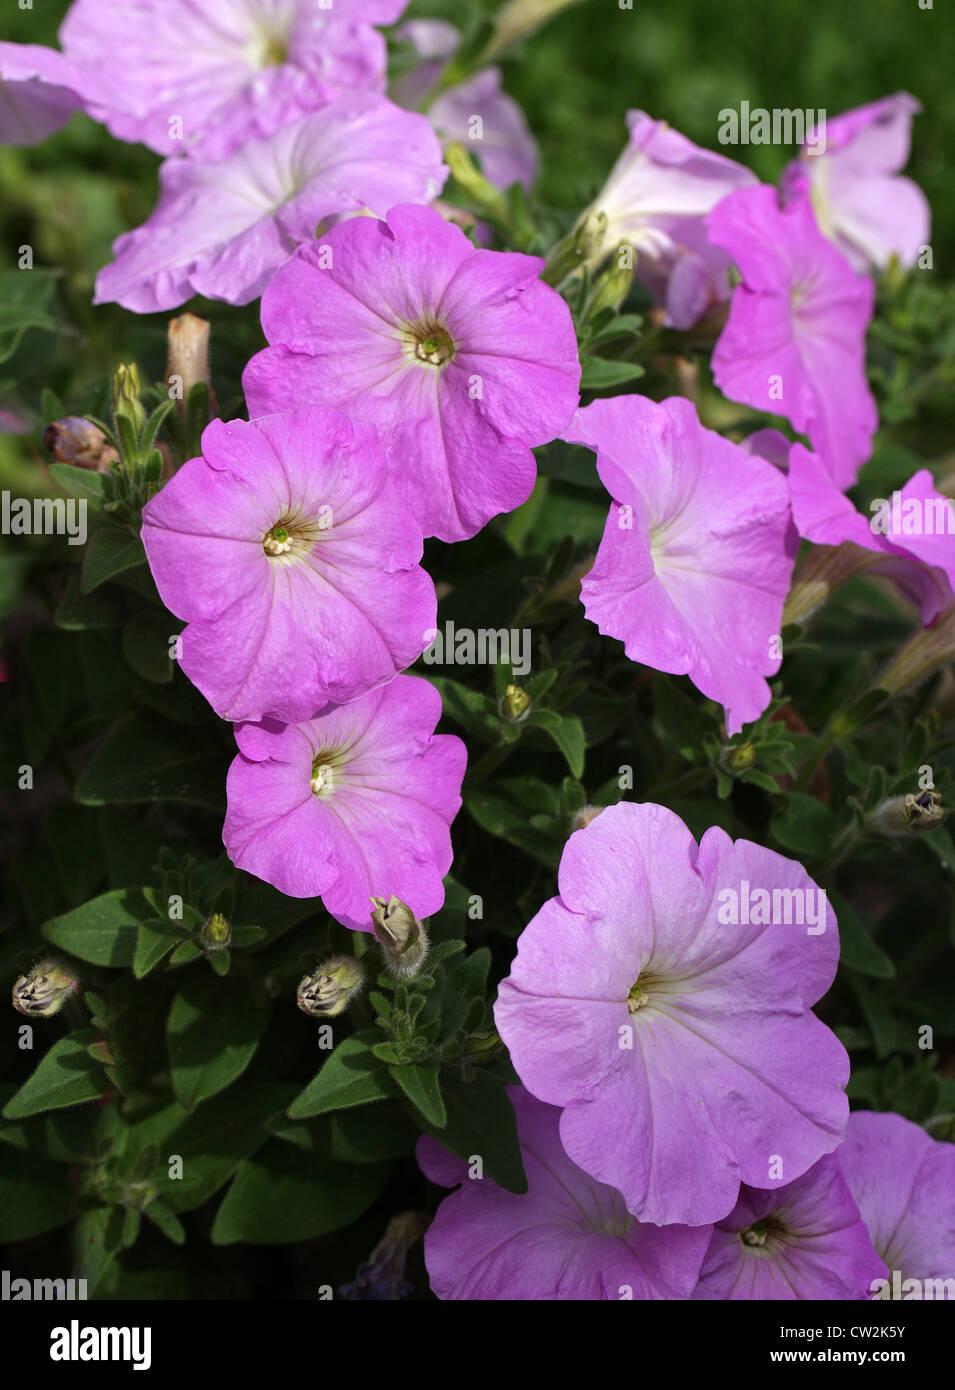 F1 Hybrid Petunias, Petunia × hybrida, Solanaceae. Garden ...